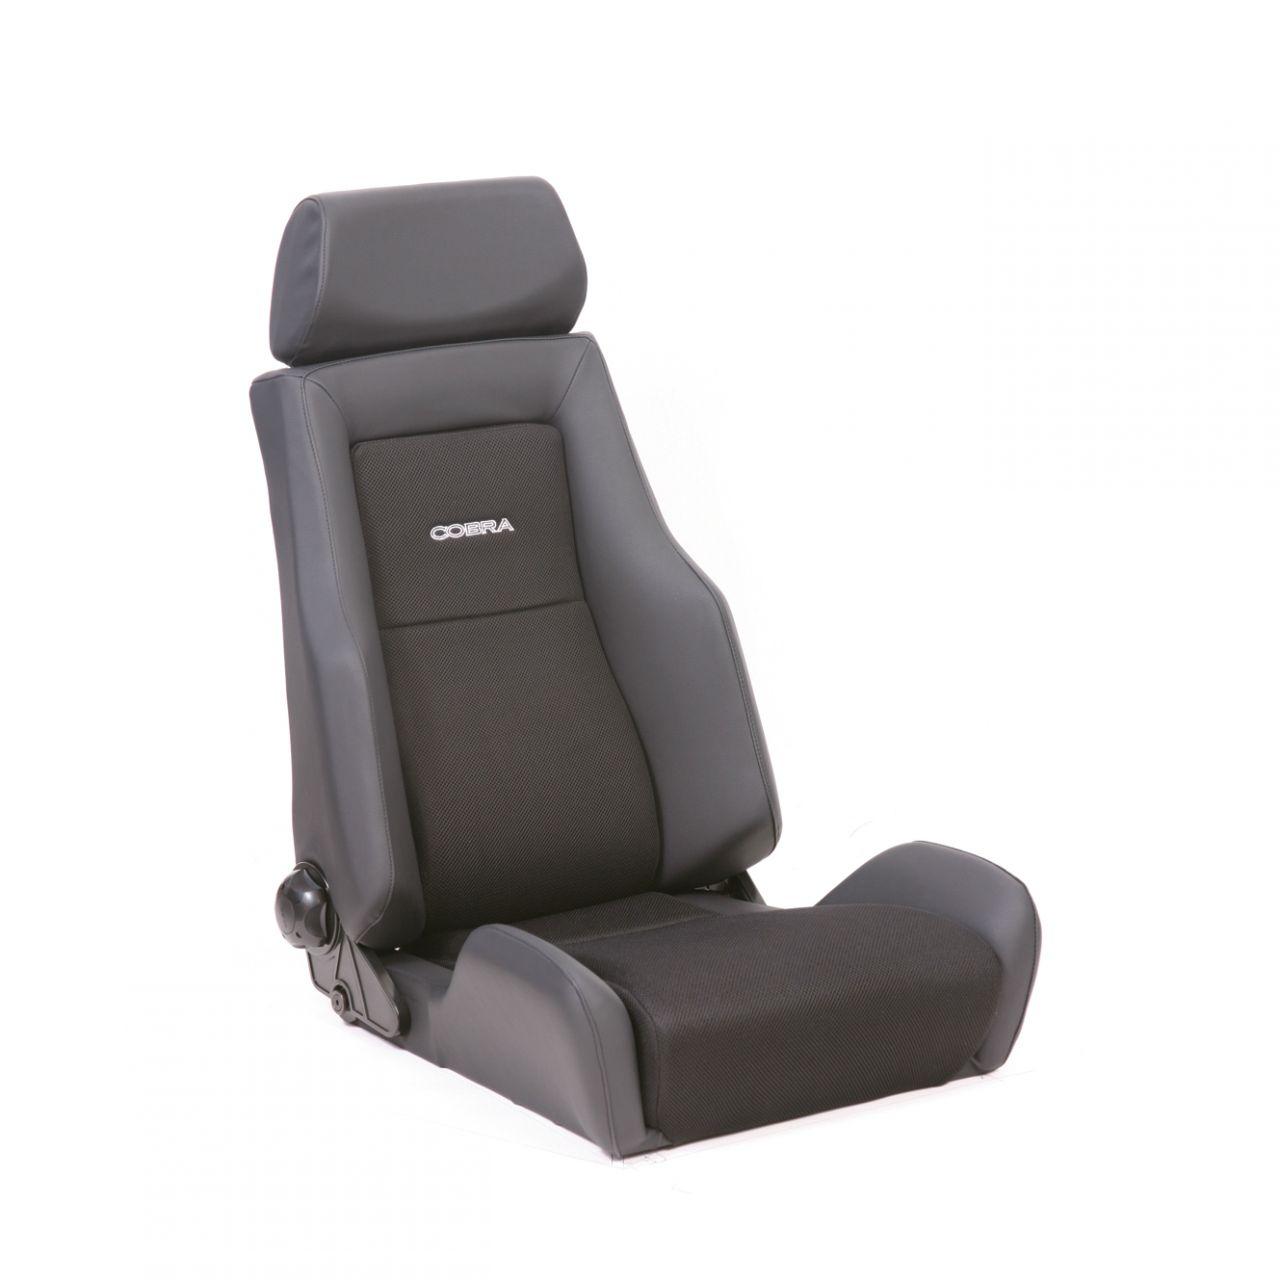 cobra le mans reclining sport seat gsm sport seats. Black Bedroom Furniture Sets. Home Design Ideas